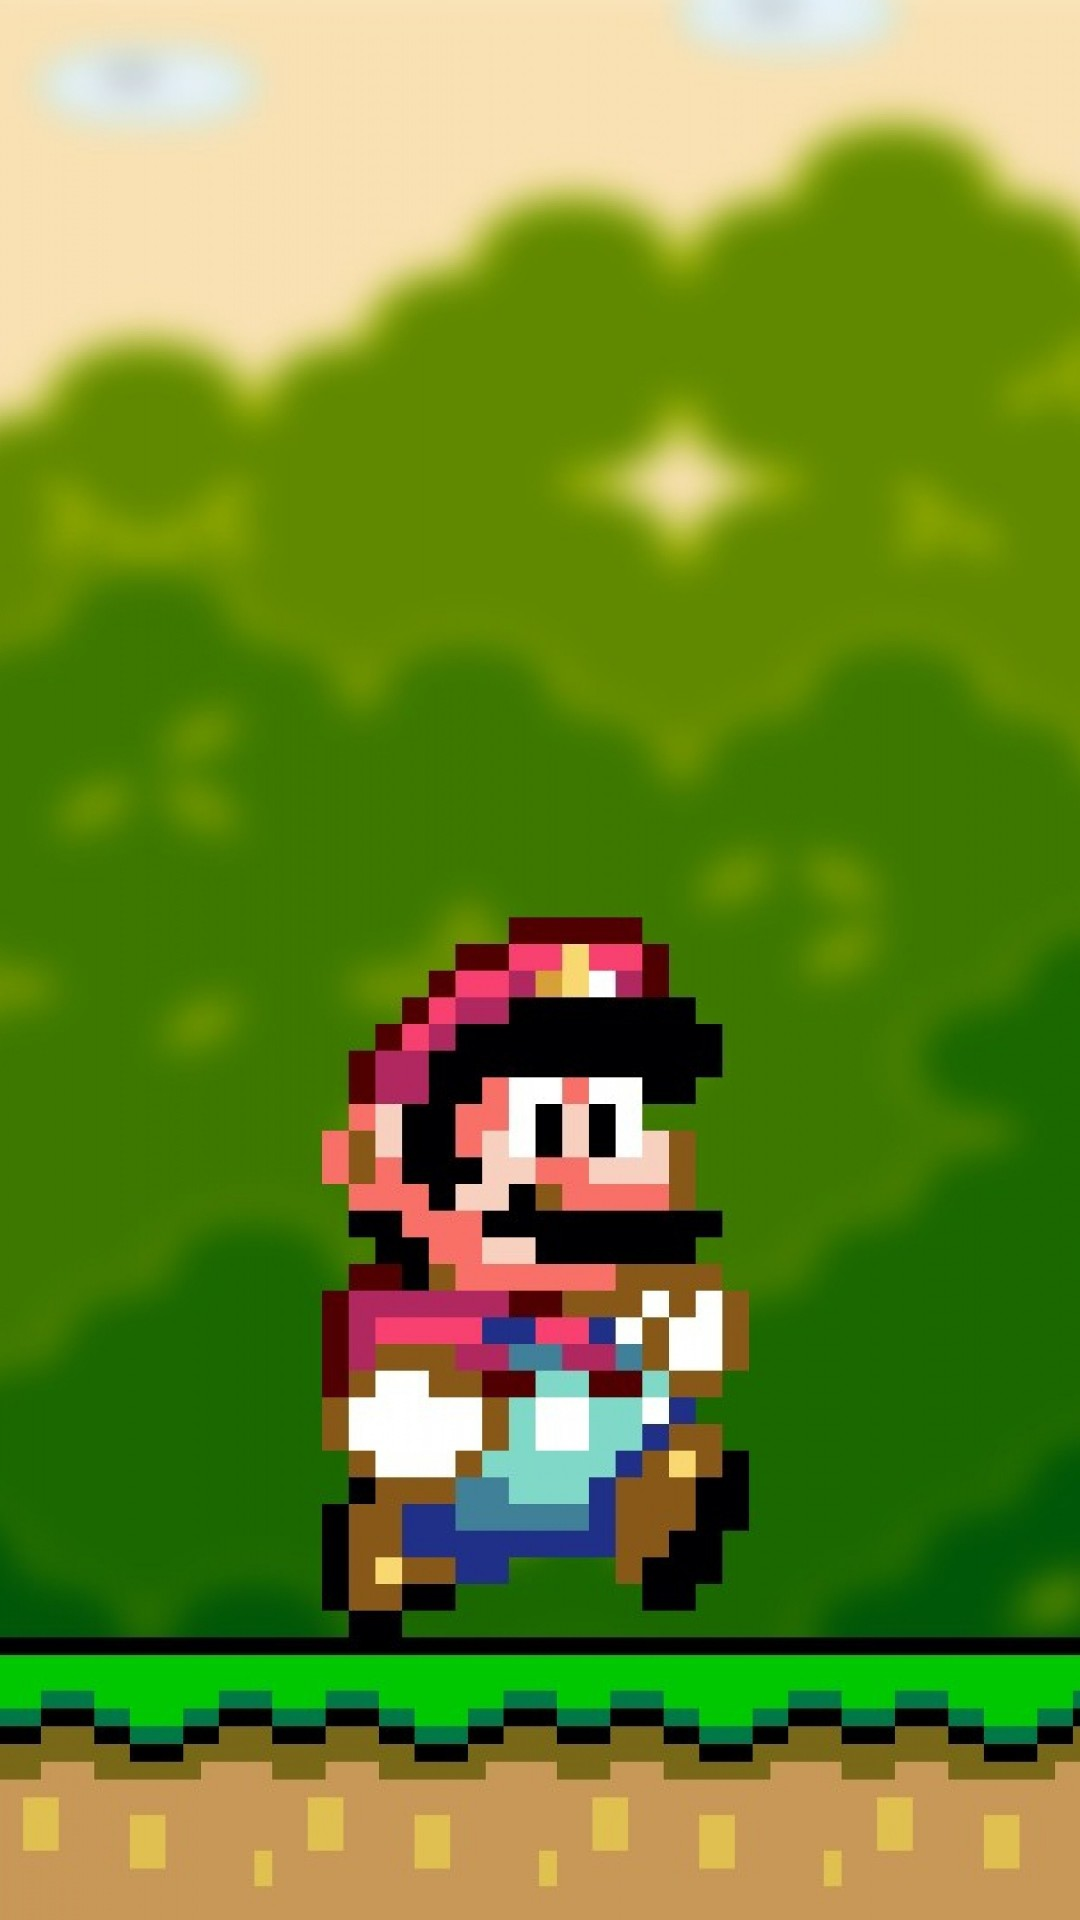 Mario-Wallpaper for iPhone.